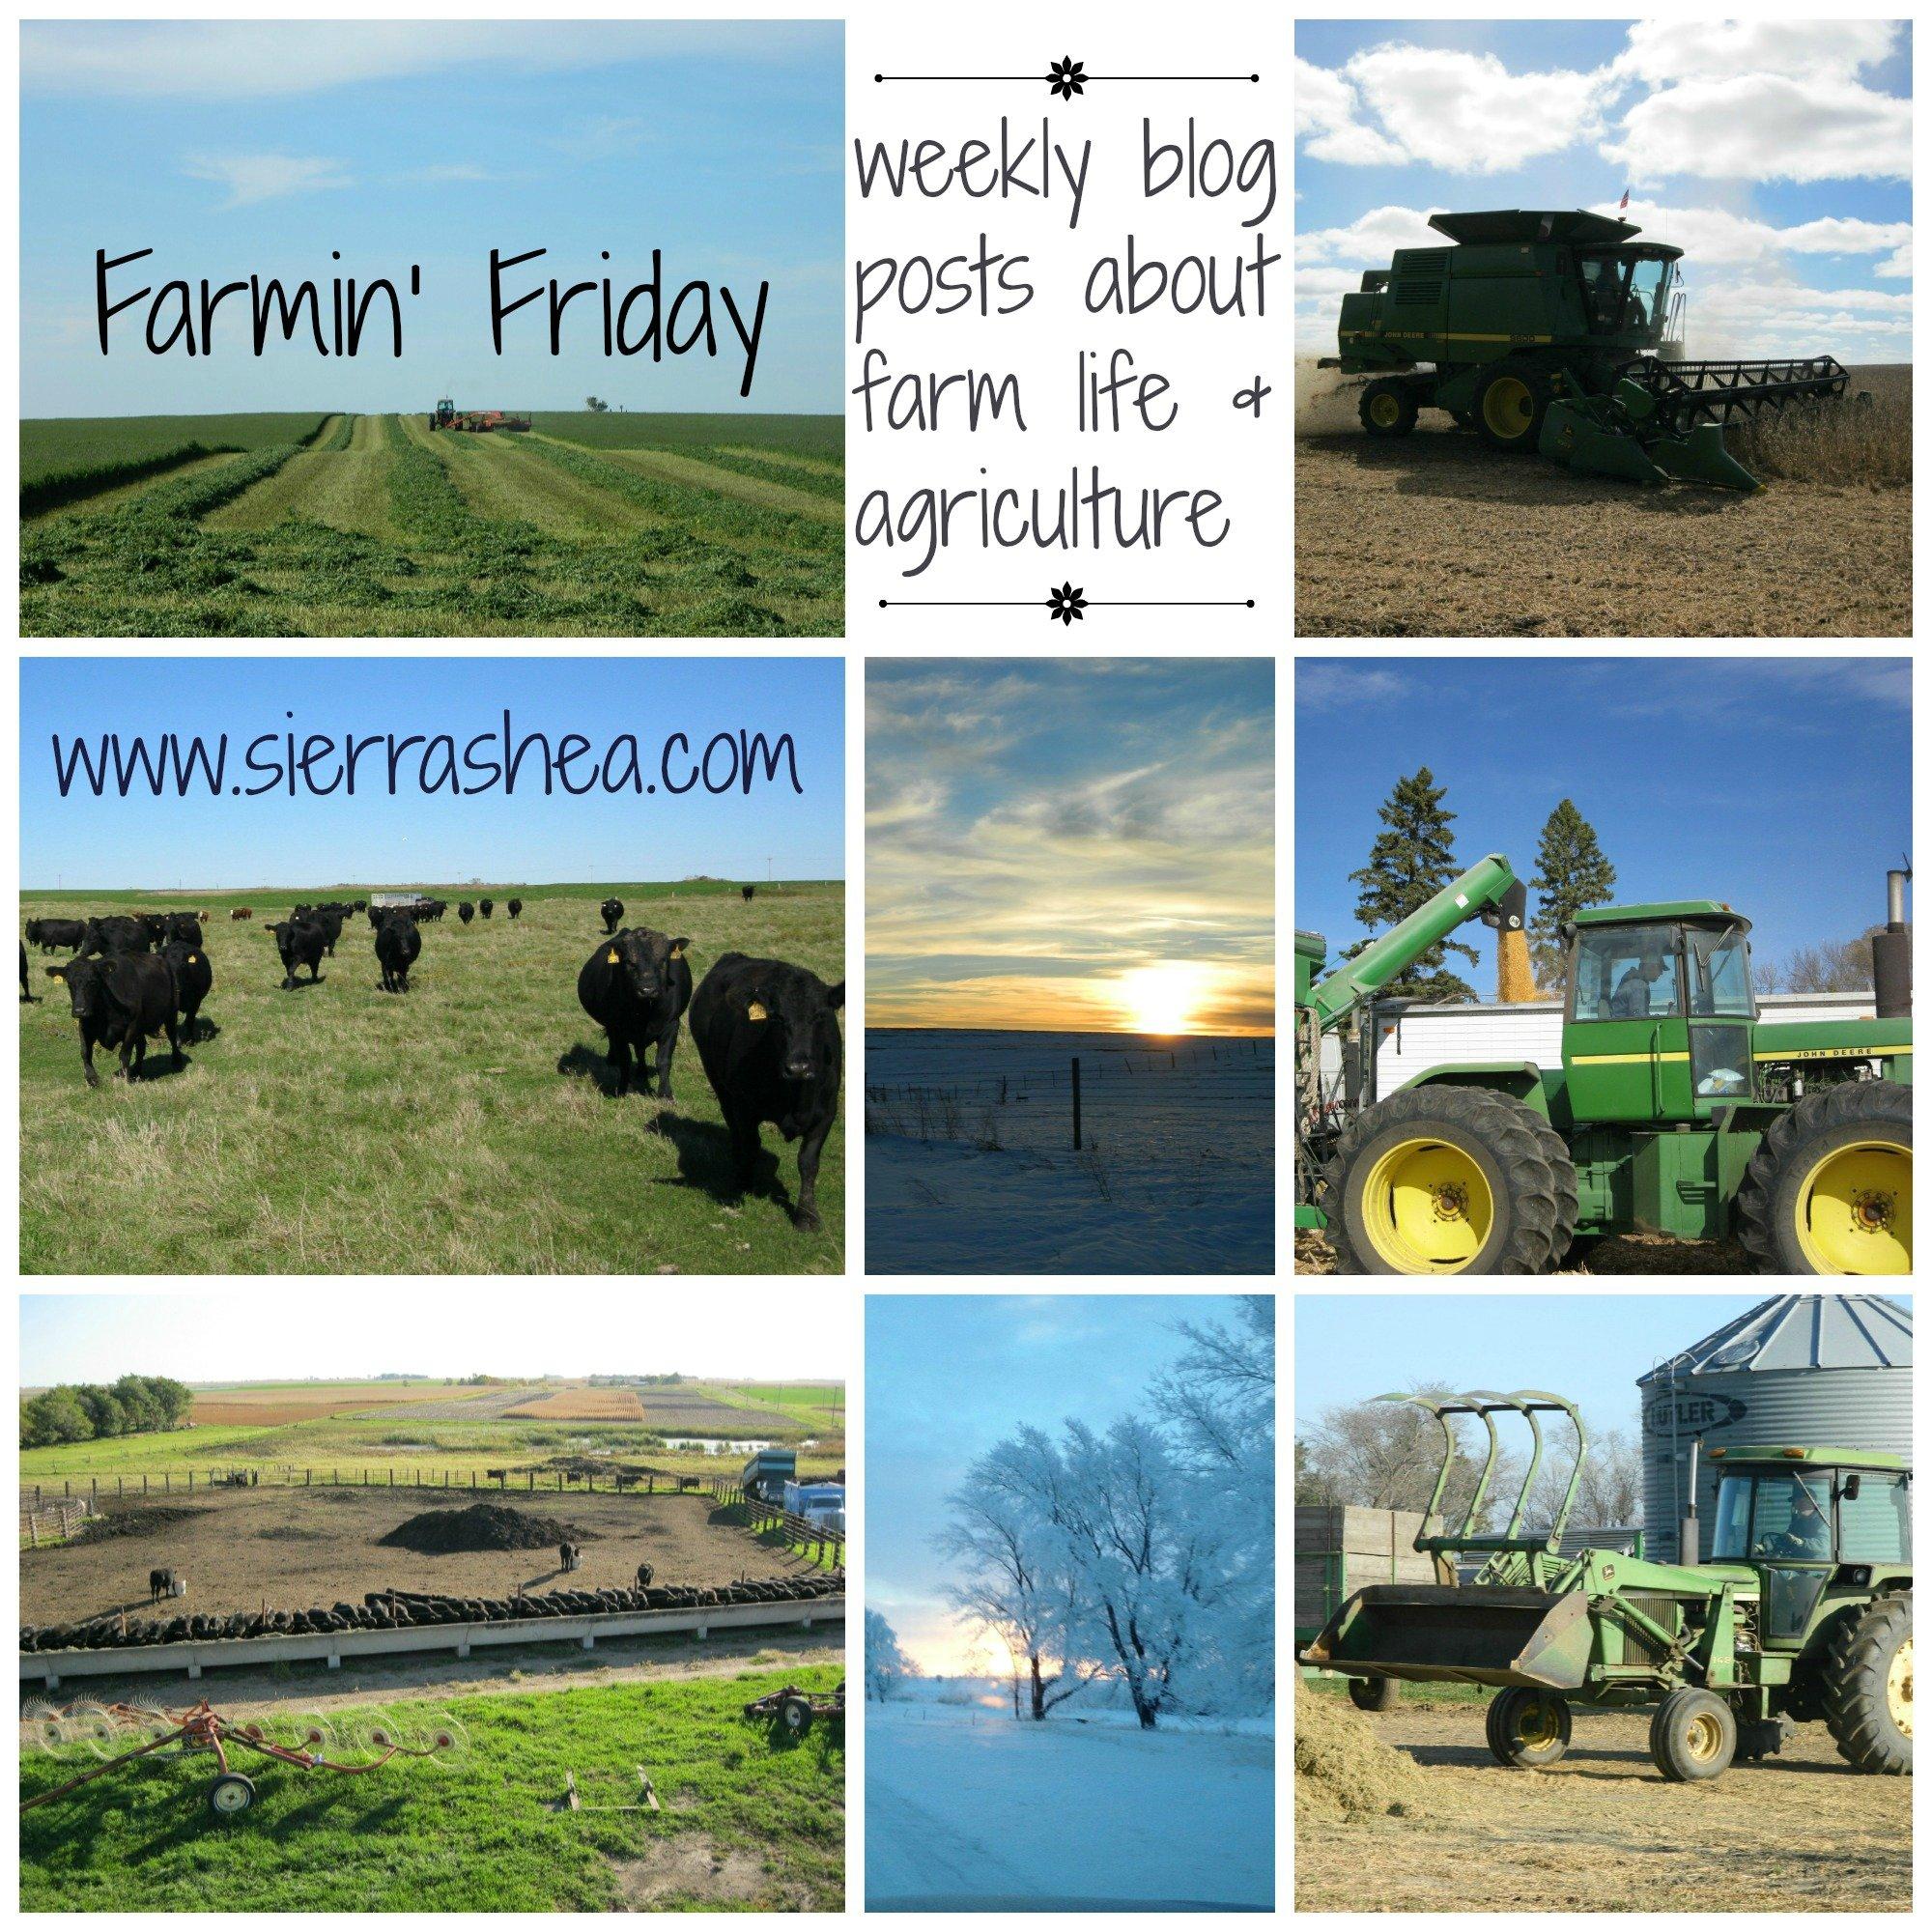 FarmingFriday